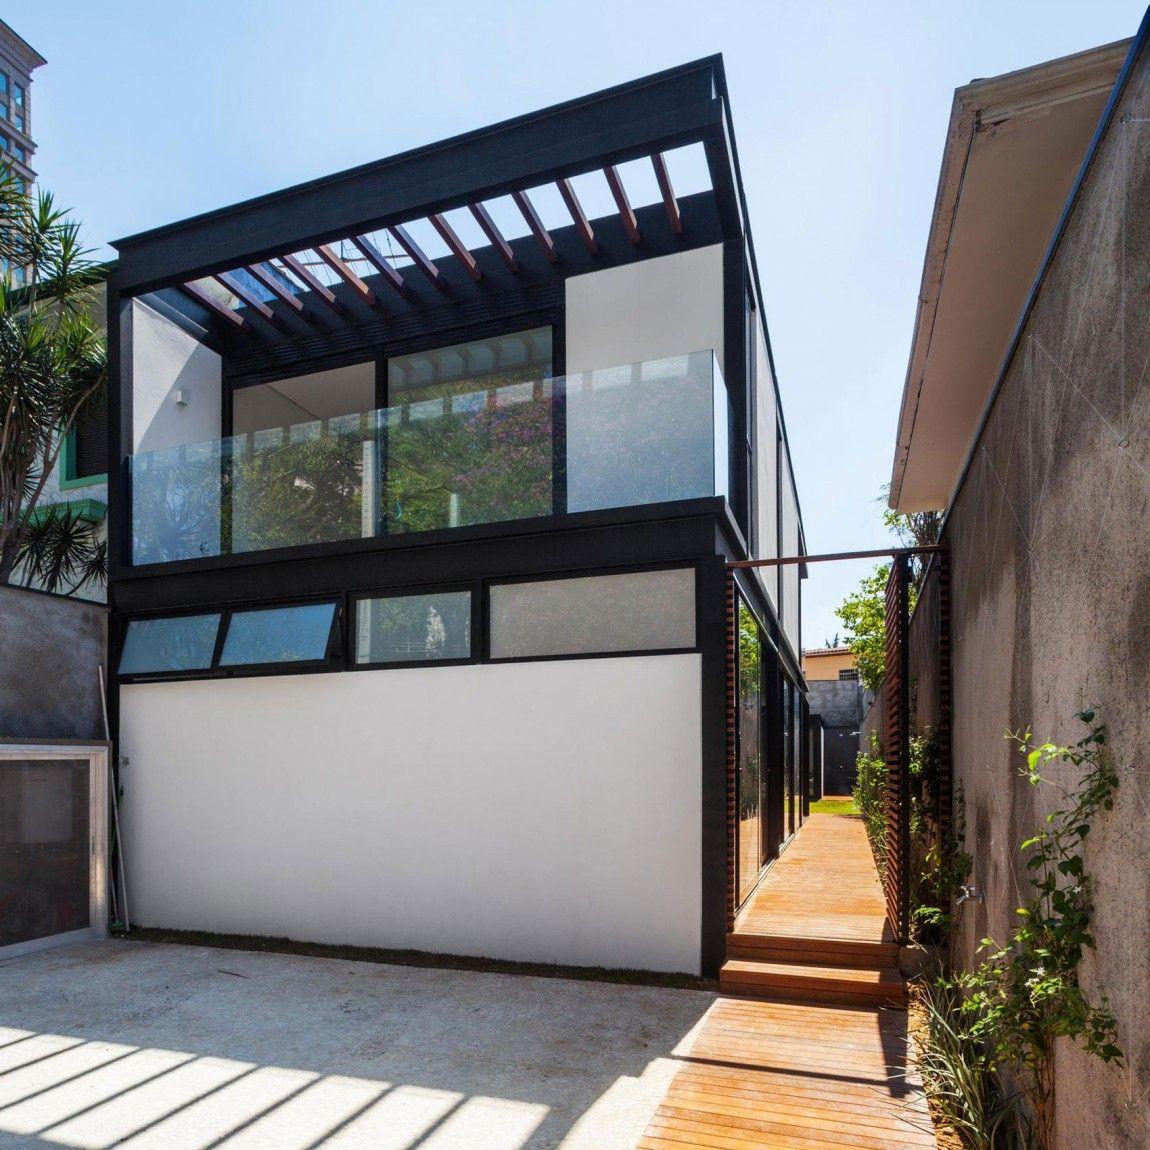 Dise o de casa larga y angosta ambientes interiores lucen - Diseno interior casas ...